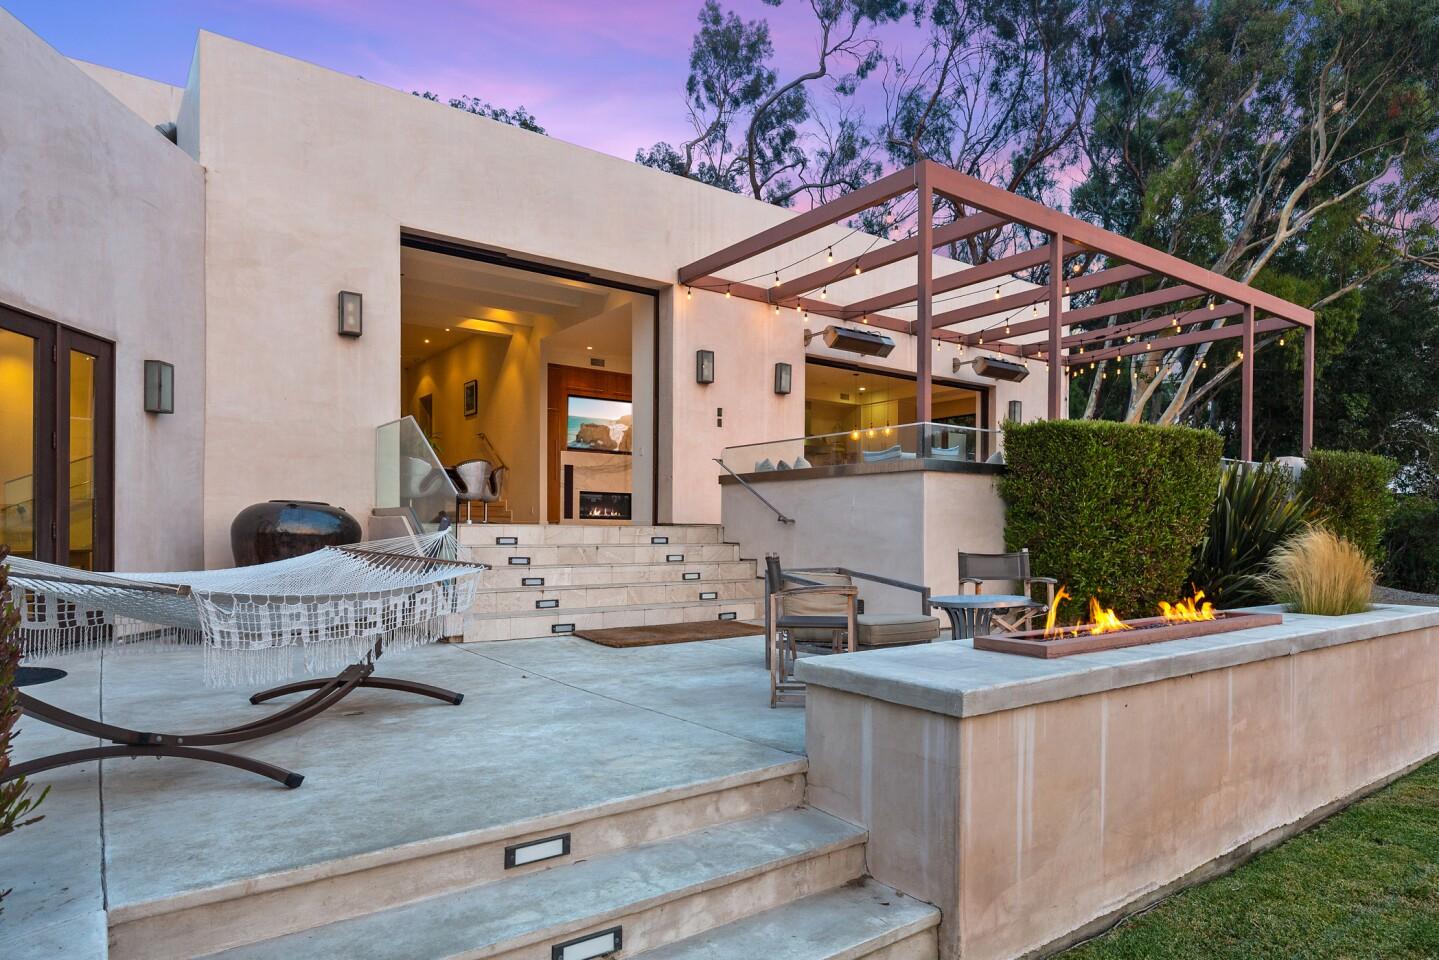 The Hemsworth family's Malibu beach house